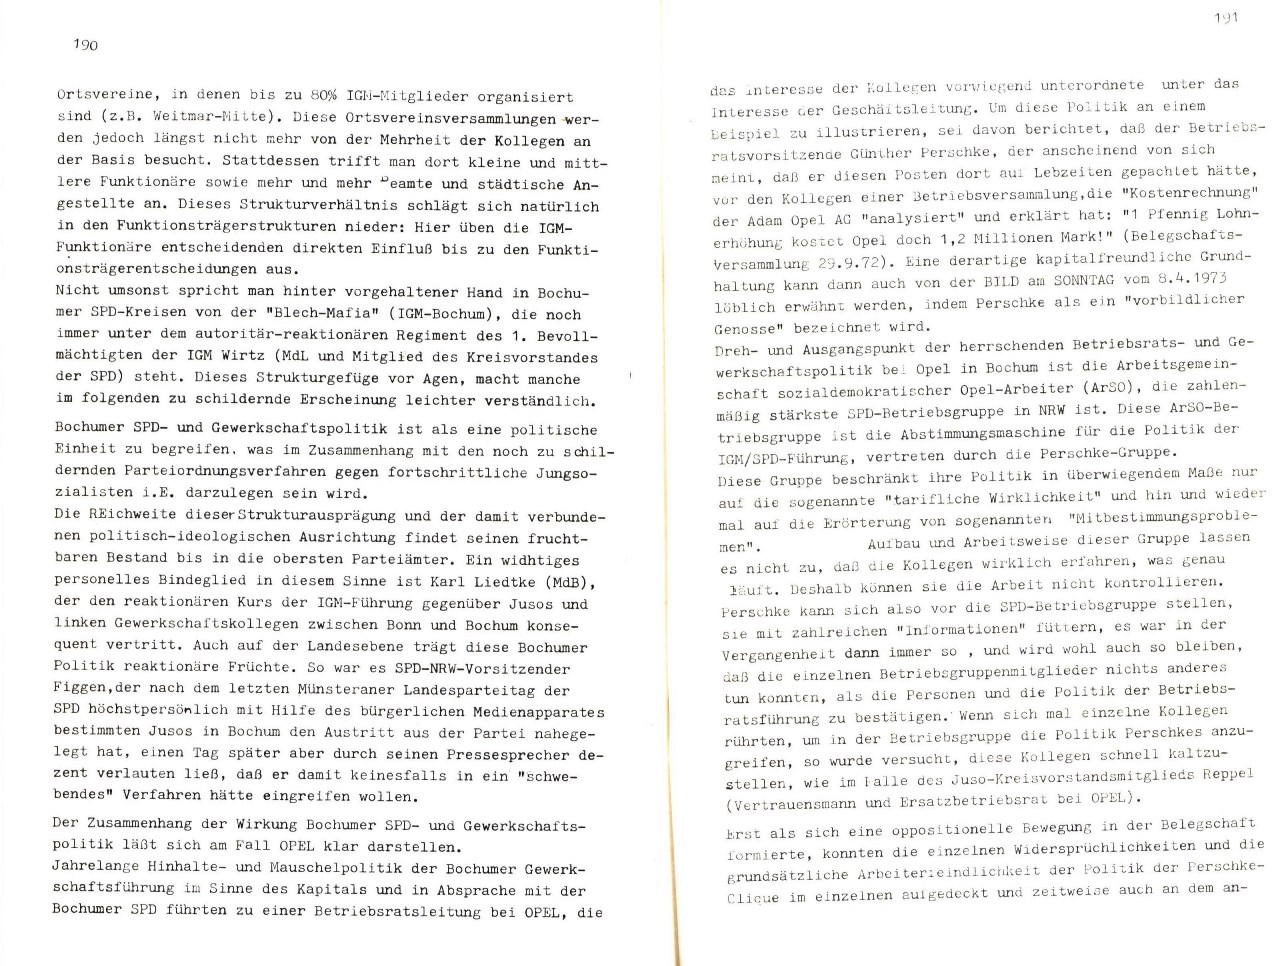 Bochum_IGM_Opel_PG_Opel_streikt_1973_098